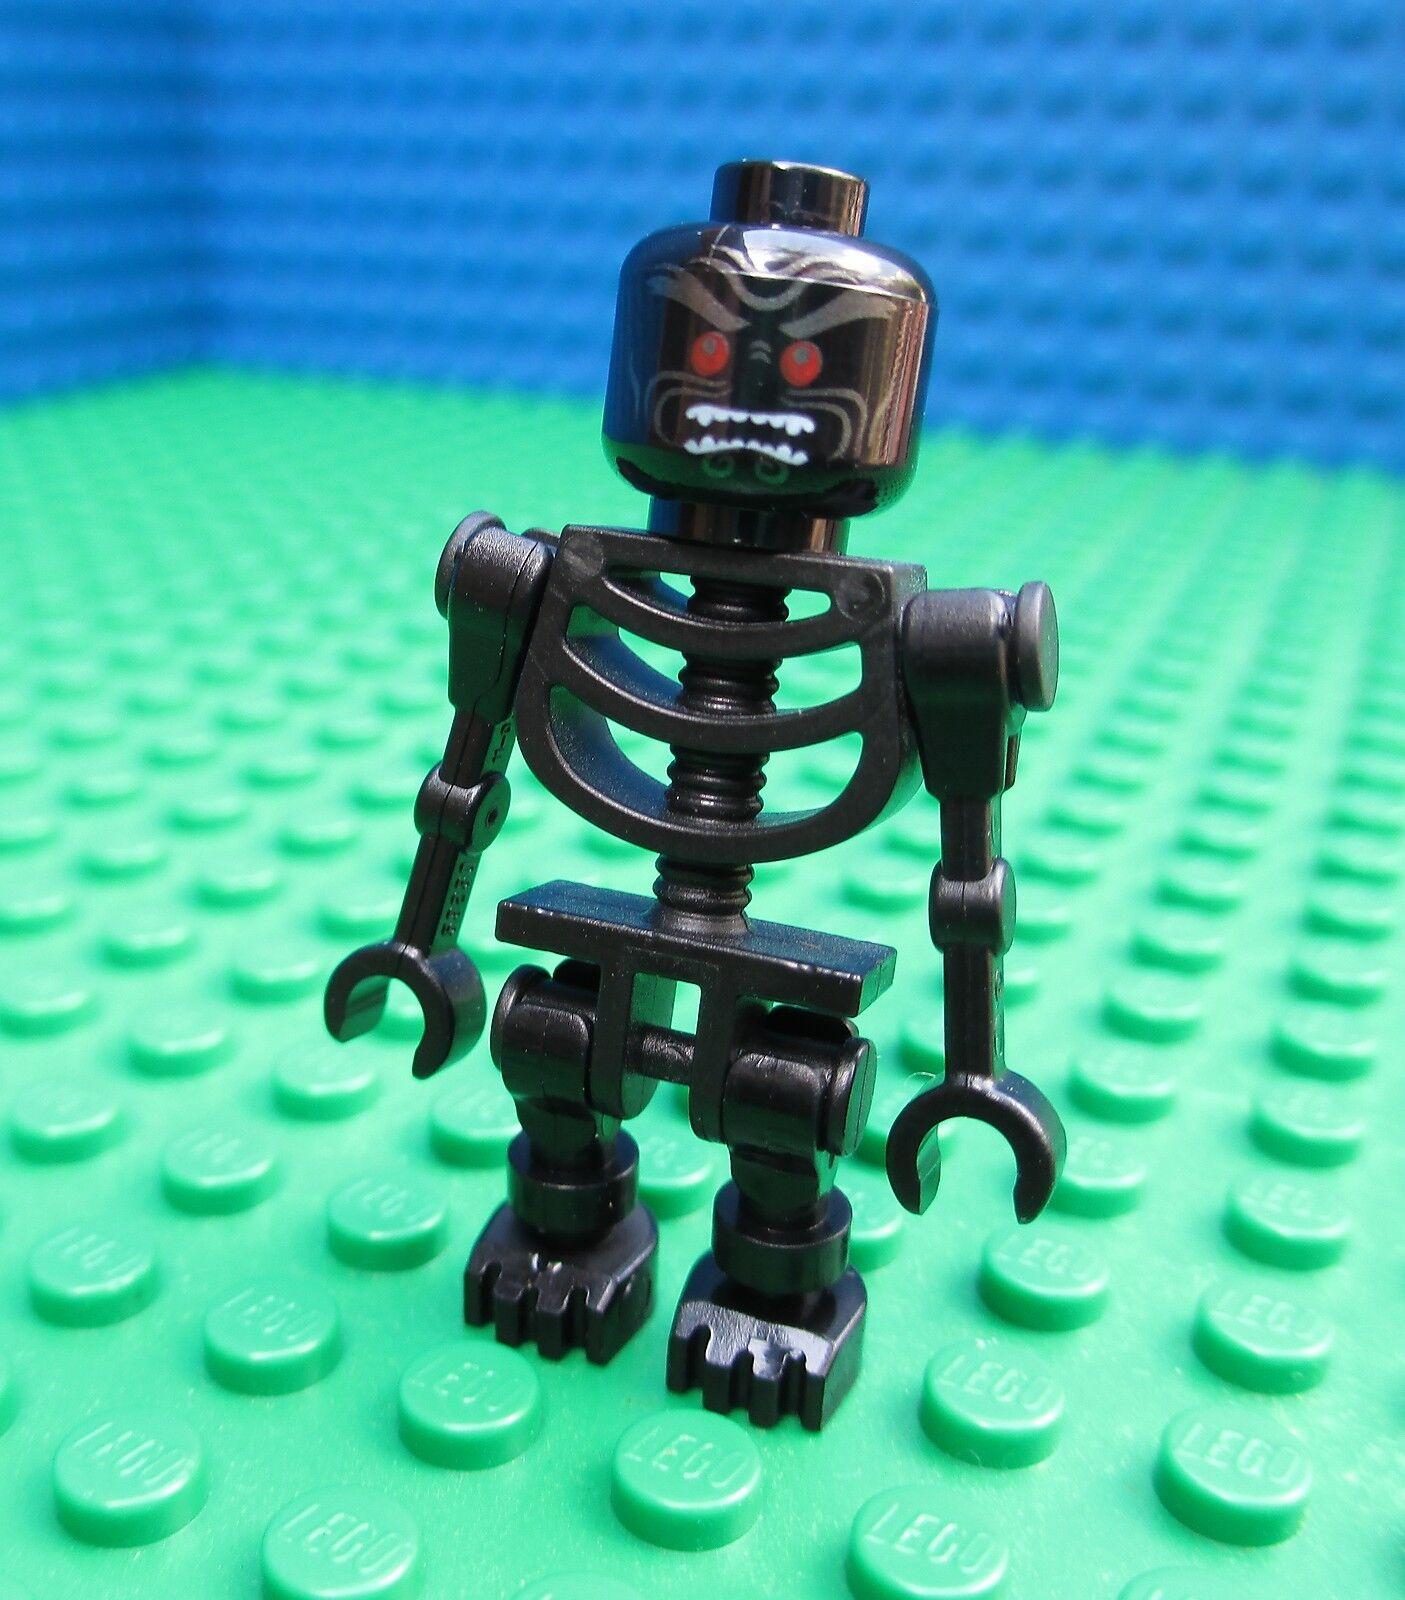 Lego Castle Black Skeleton with Angry Head Minifigure Minifig Kingdoms Ninjago